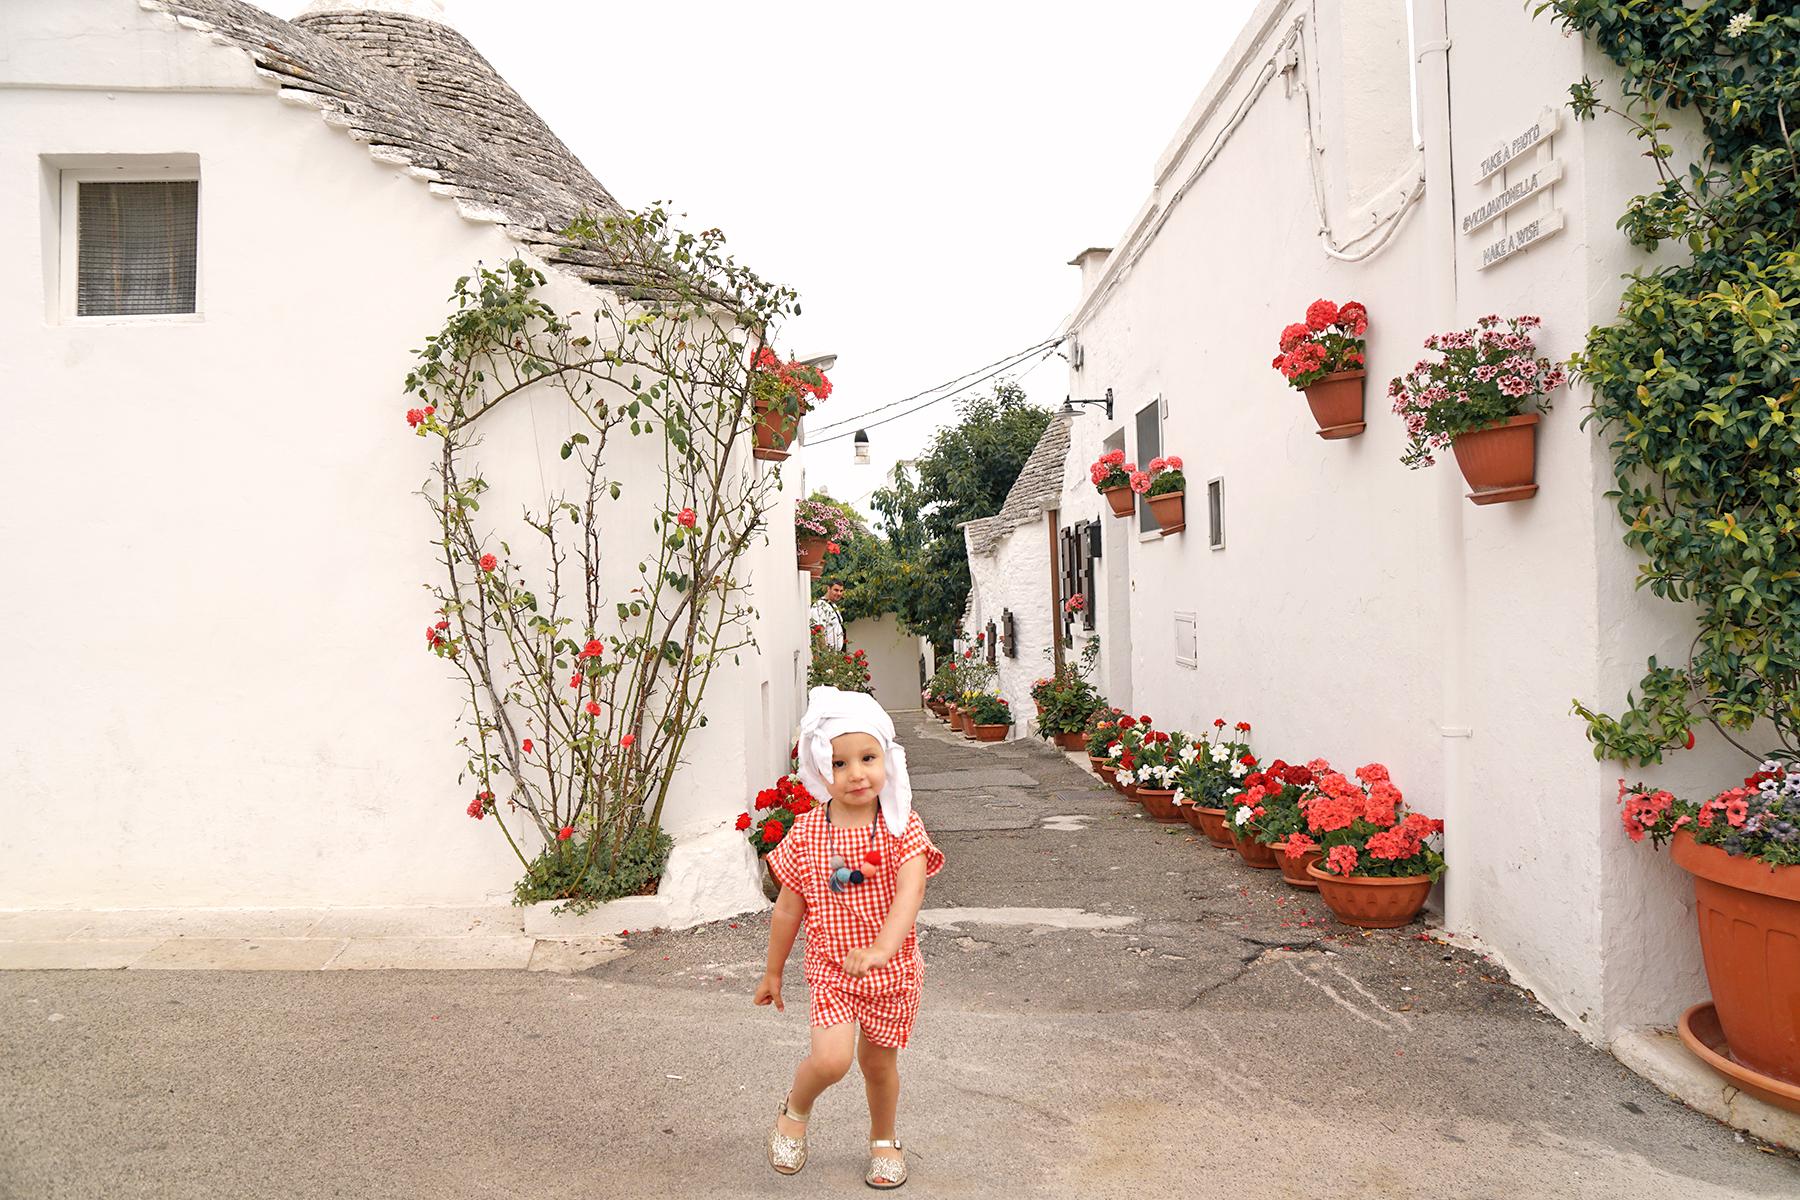 Petite fille à Alberobello fleurie, Pouilles Italie